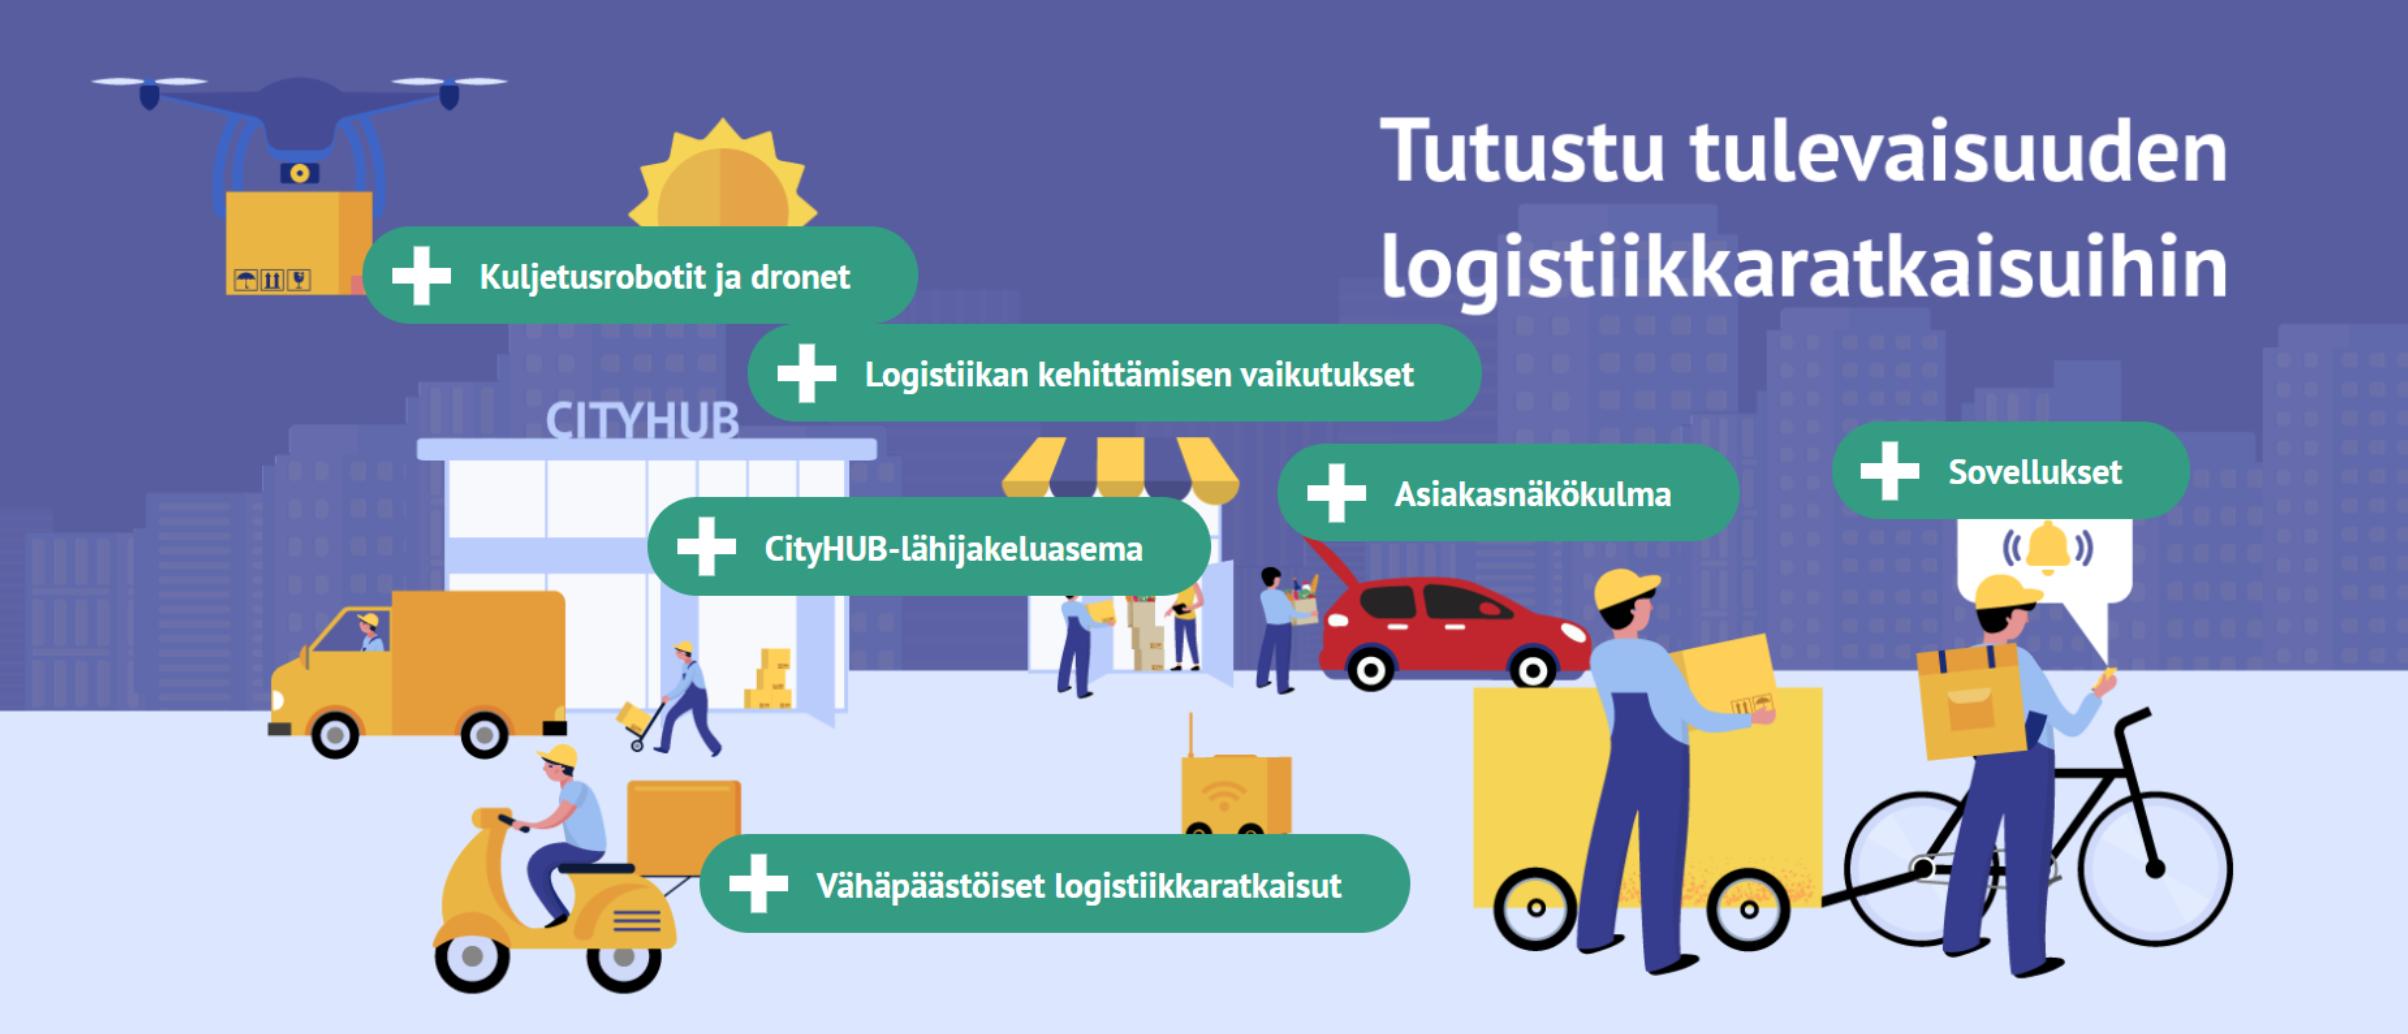 Cover for article 'Citylogistiikan uudet ratkaisut -webinaari'